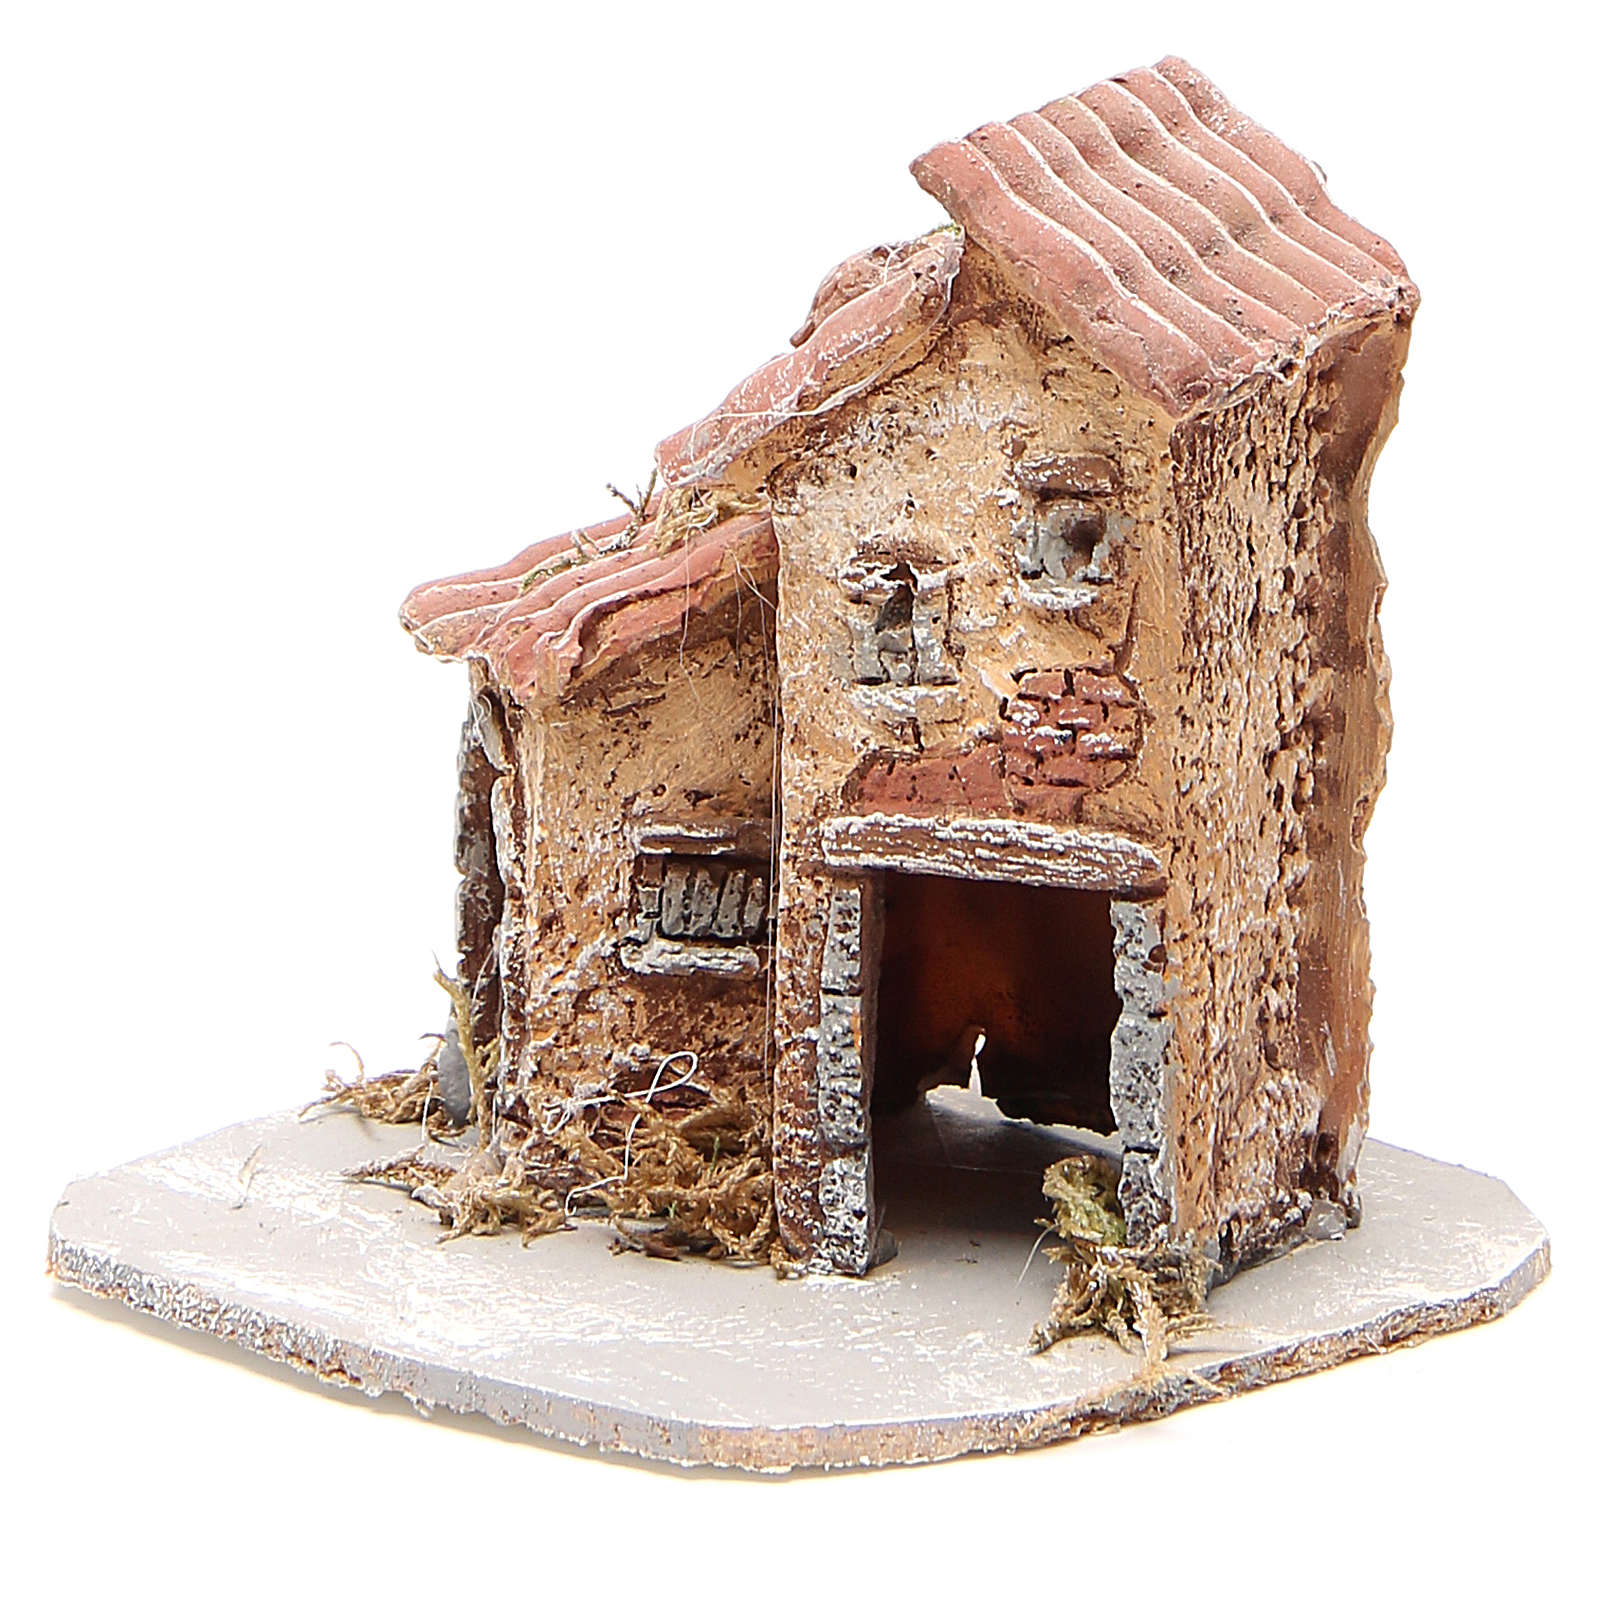 Casa presepe napoletano resina e legno 14x14x14 cm 4